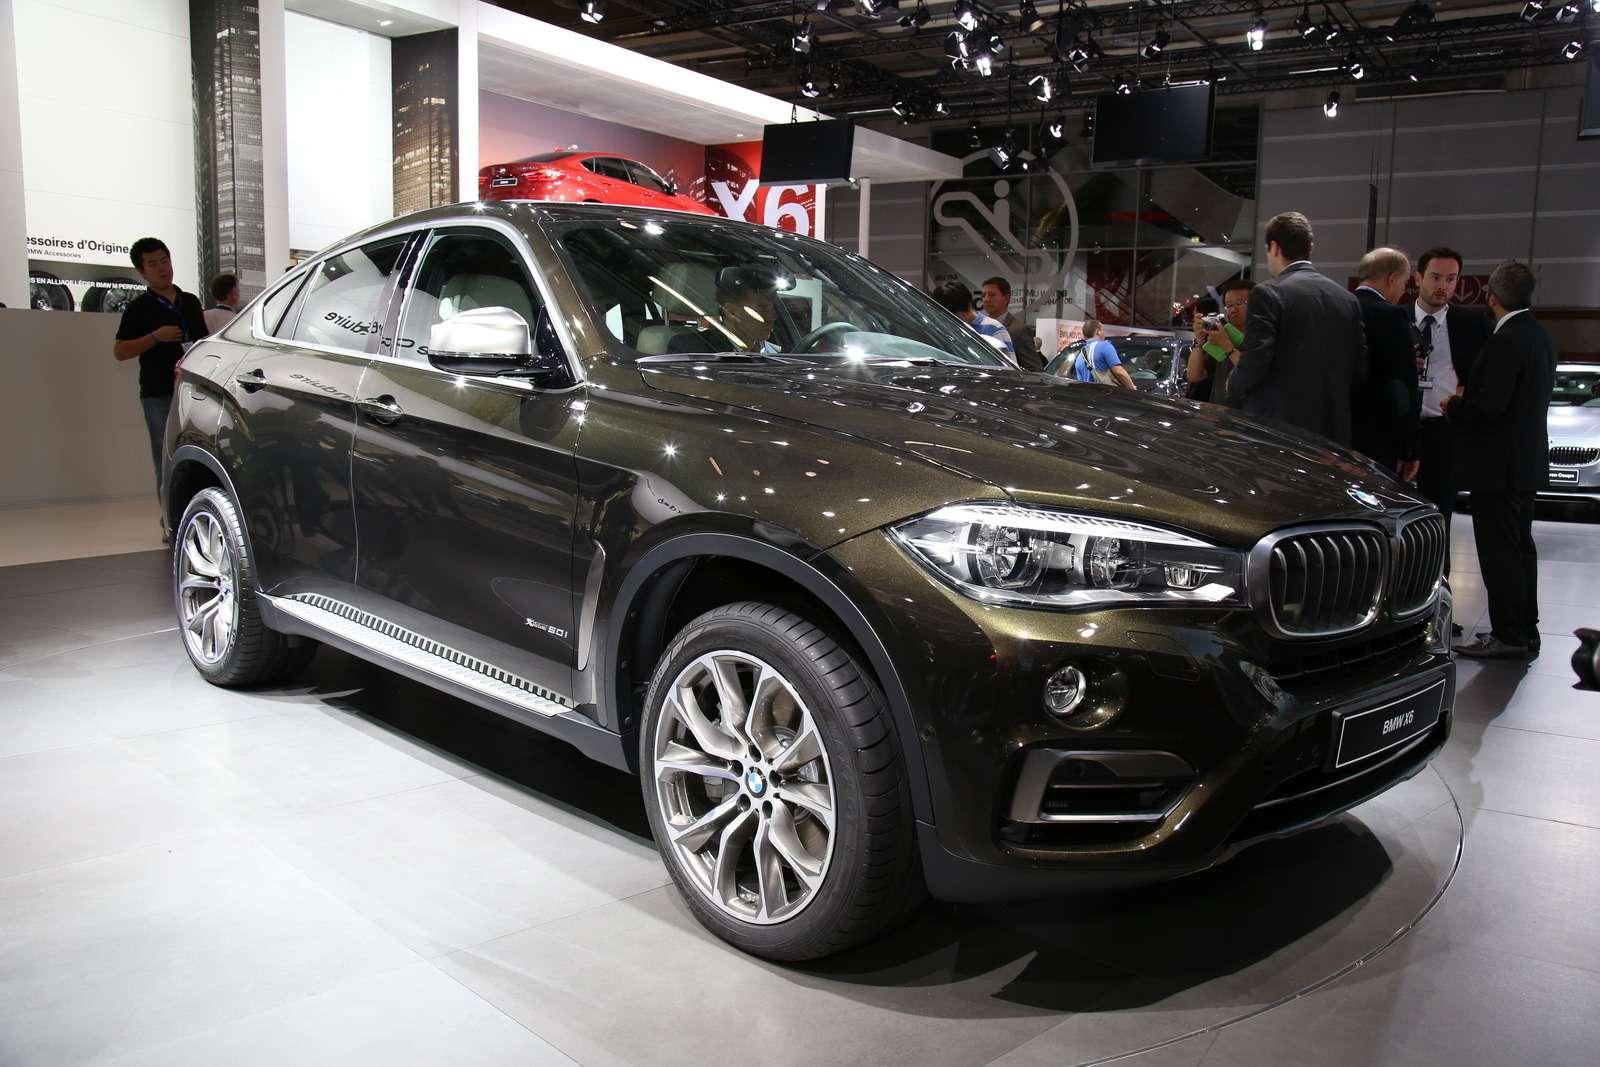 BMWX6_1_новый размер